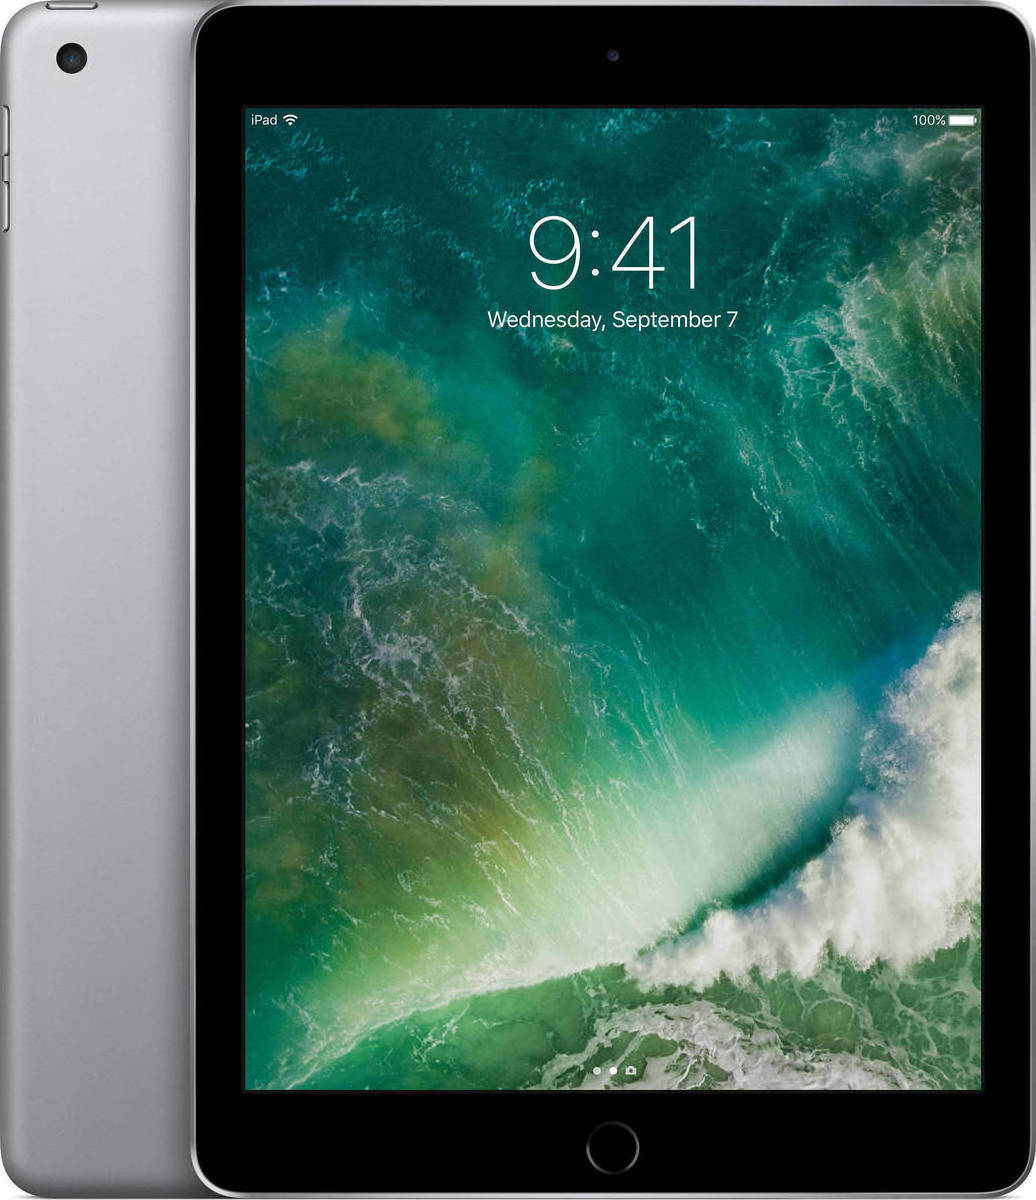 Apple iPad 9.7'' 2017 WiFi 32GB Space Grey EU Με Αντάπτορα Πληρωμή έως 12 δόσεις